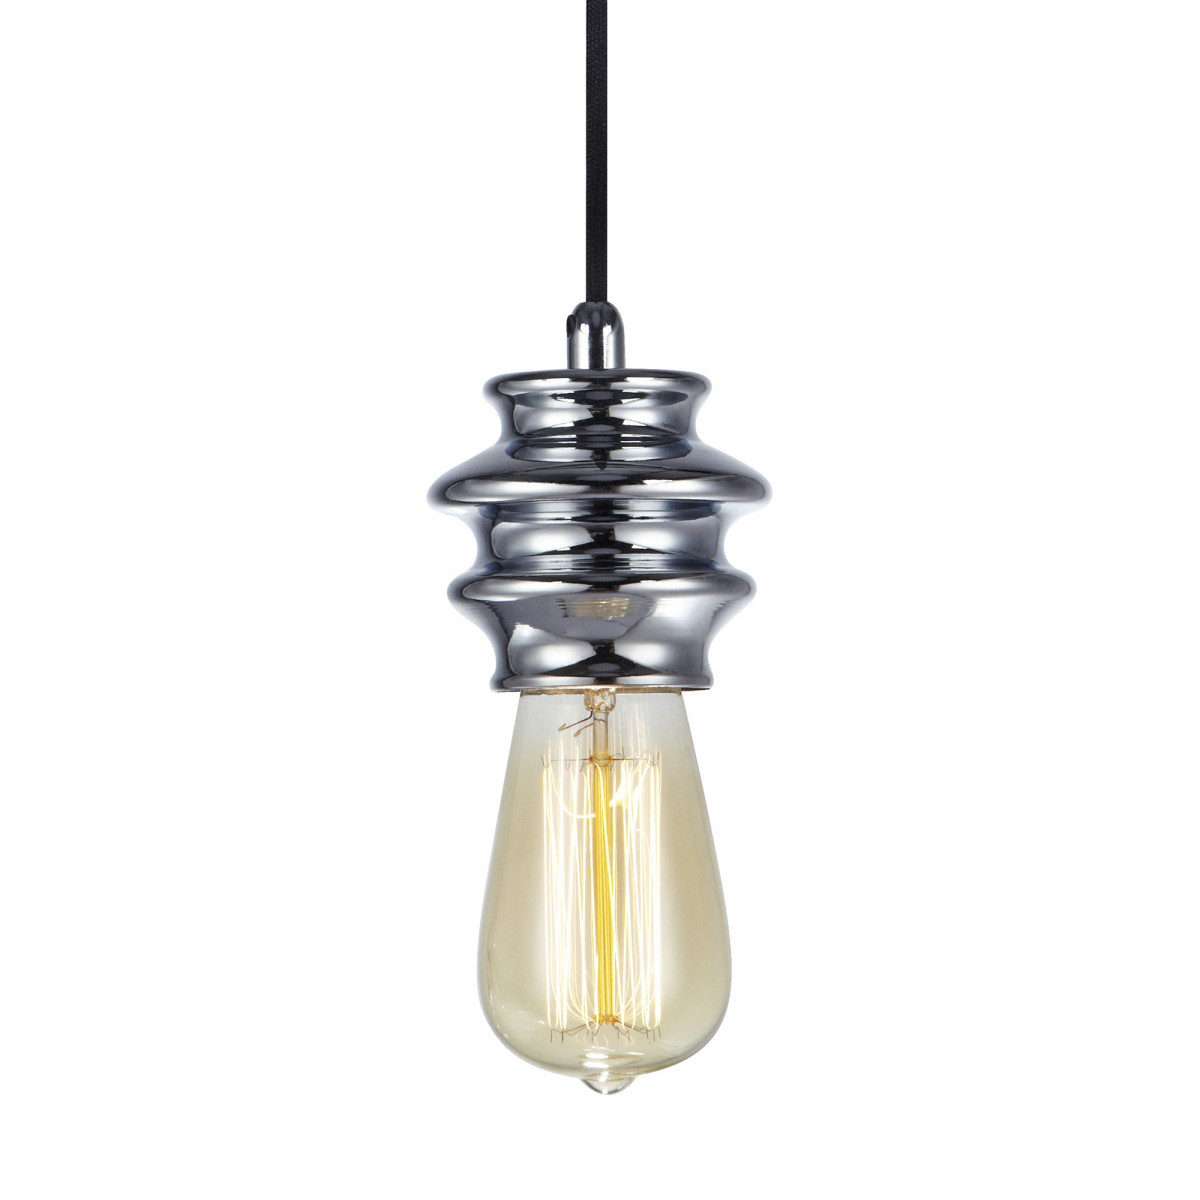 Hanglamp Fab 1-lichts chroom